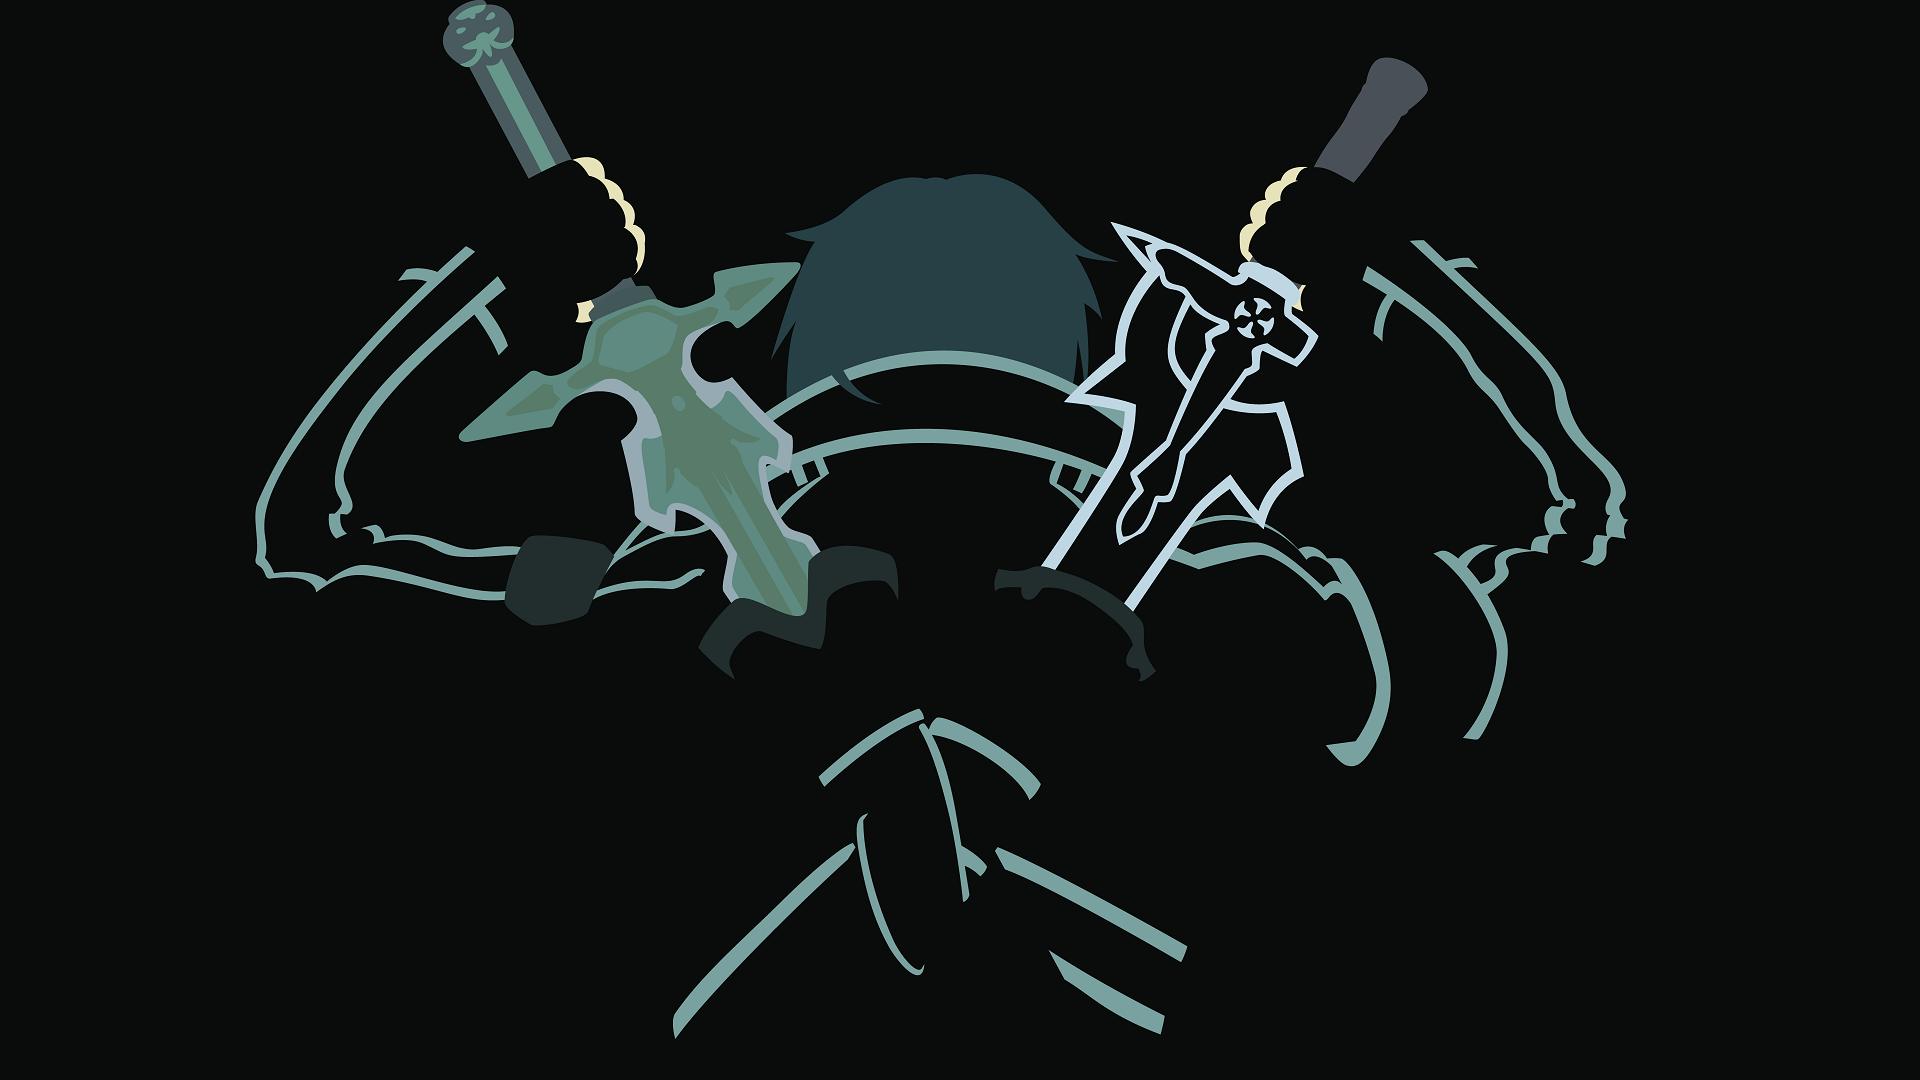 Sword art online hd wallpaper background image for Minimal art online